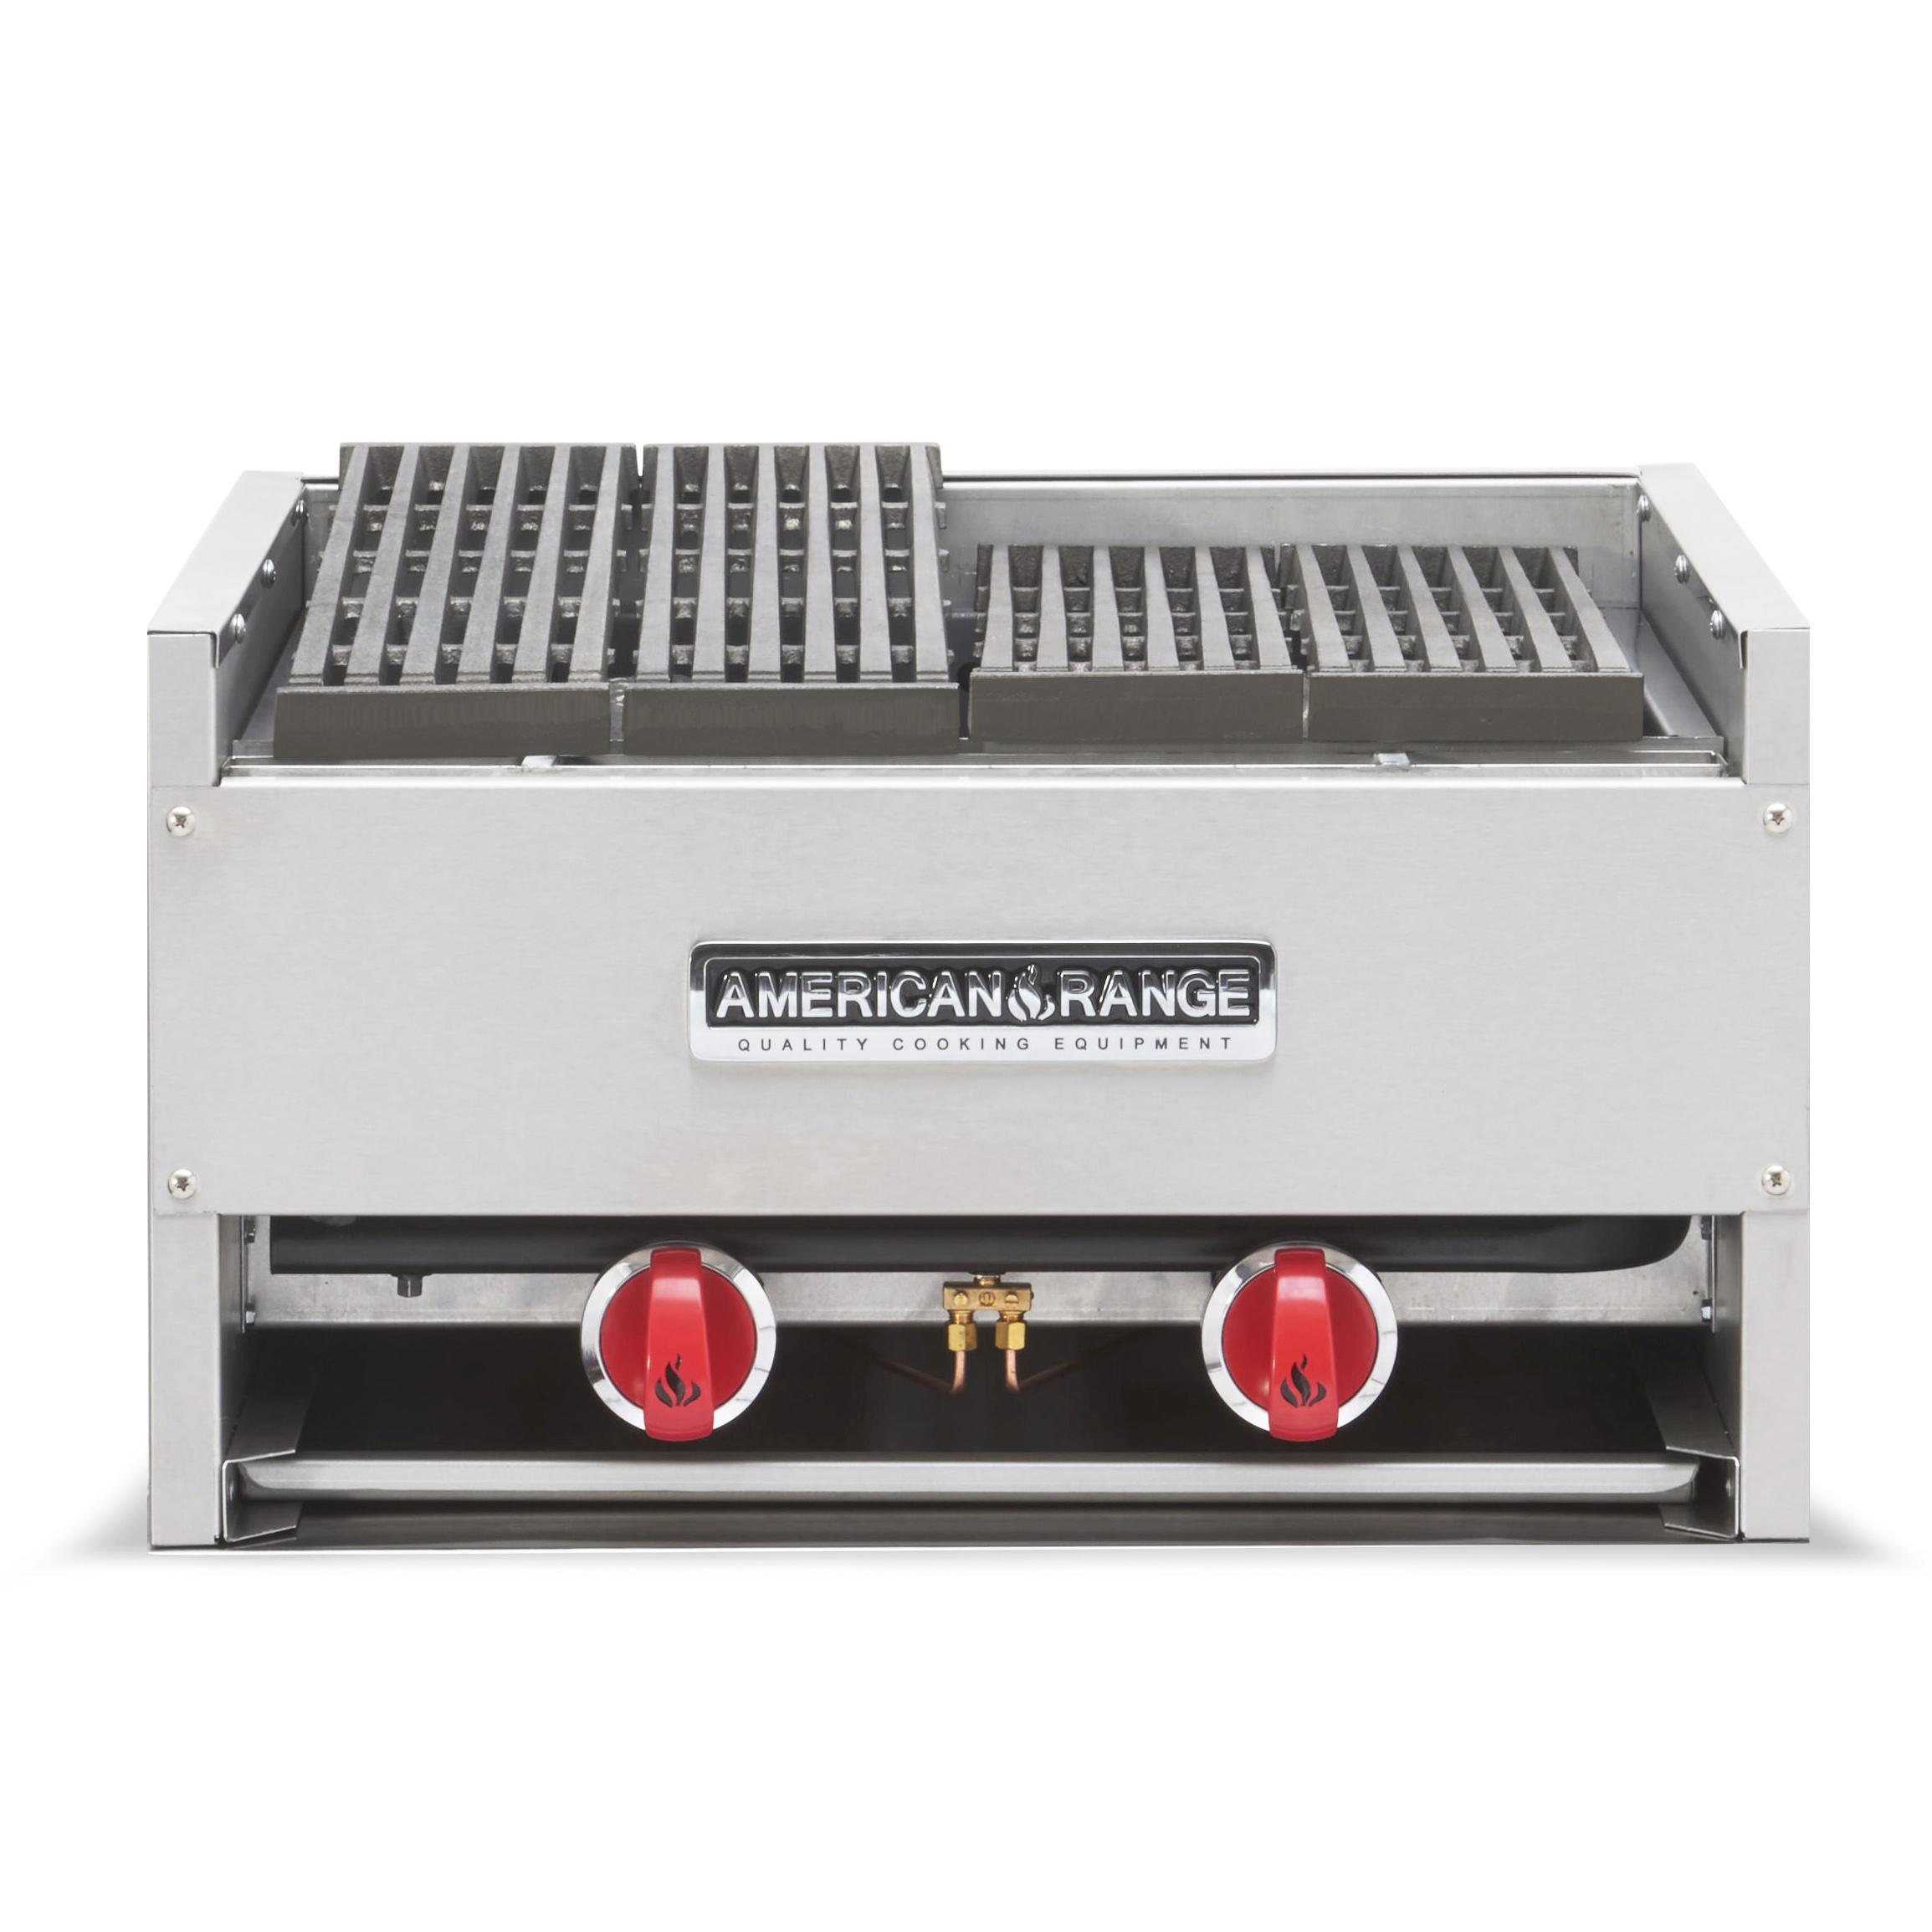 American Range AECB-72 charbroiler, gas, countertop